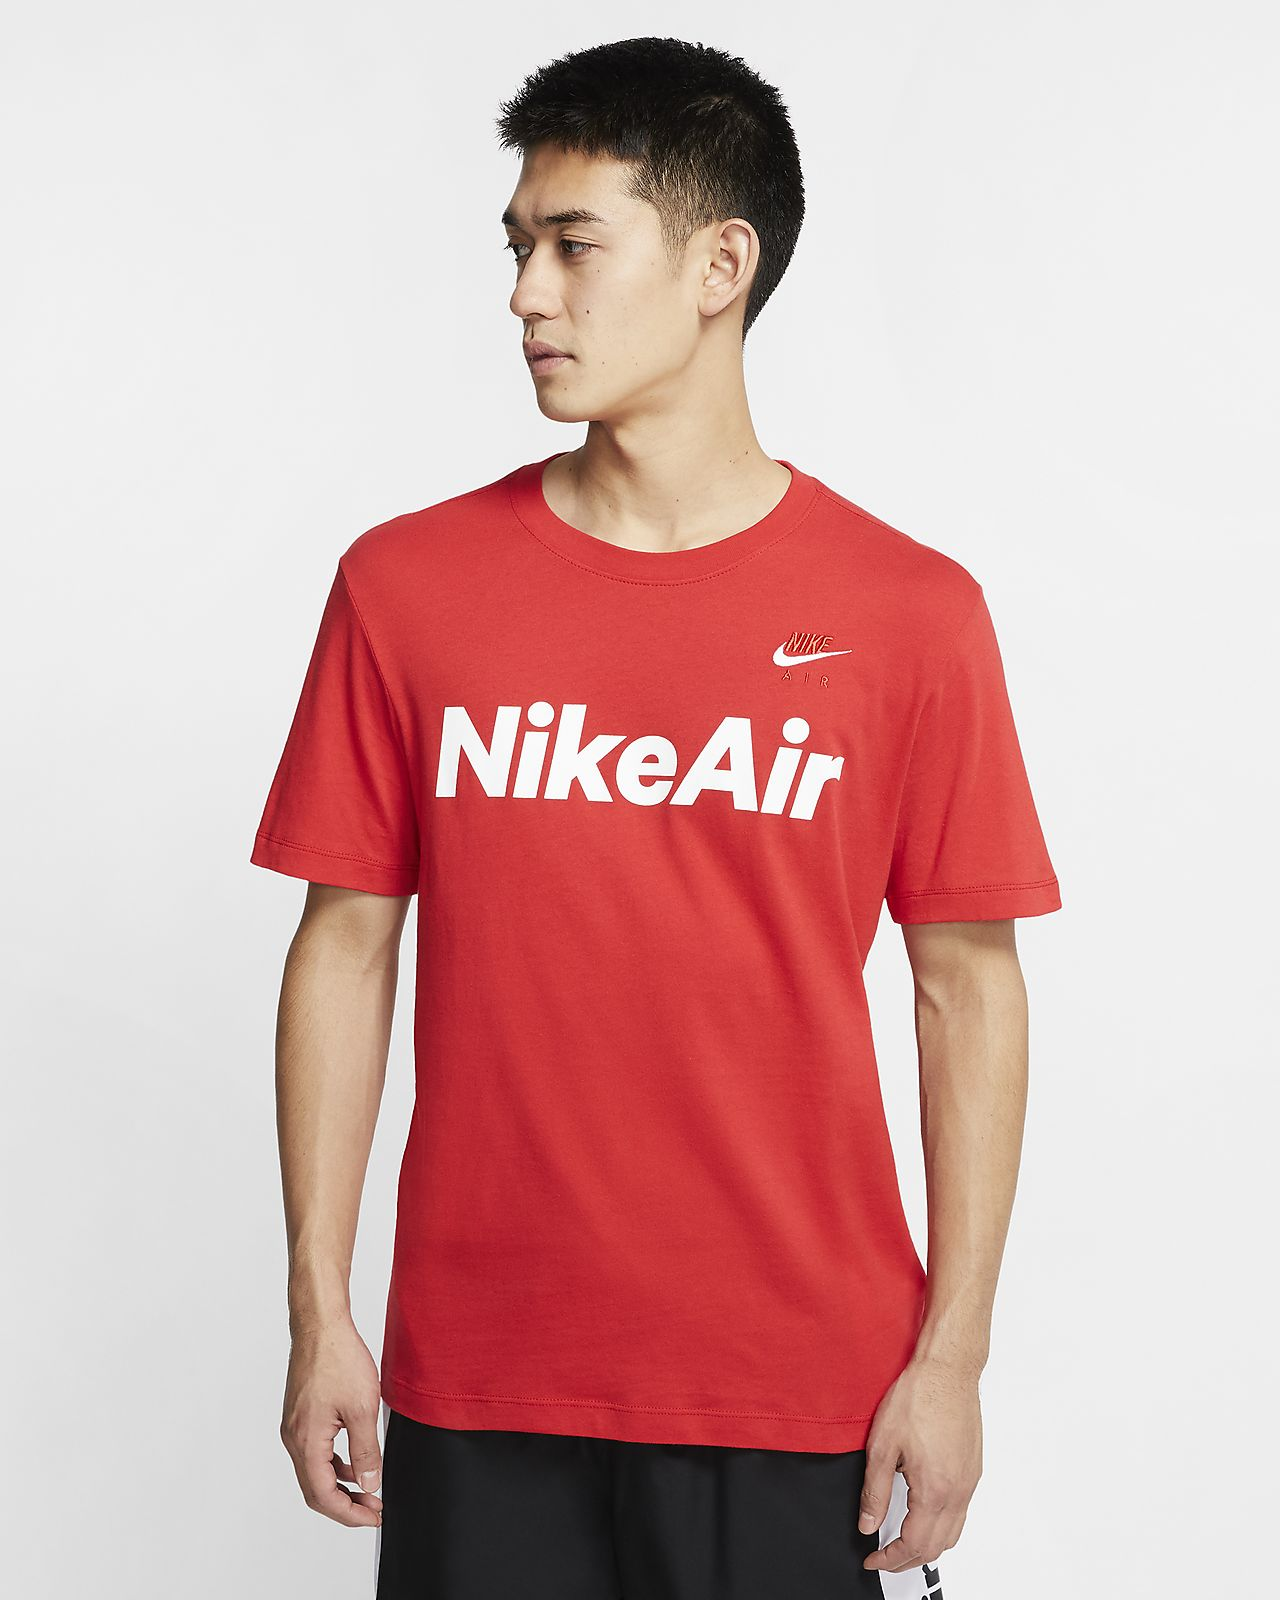 Nike Air Men's T-Shirt. Nike IL